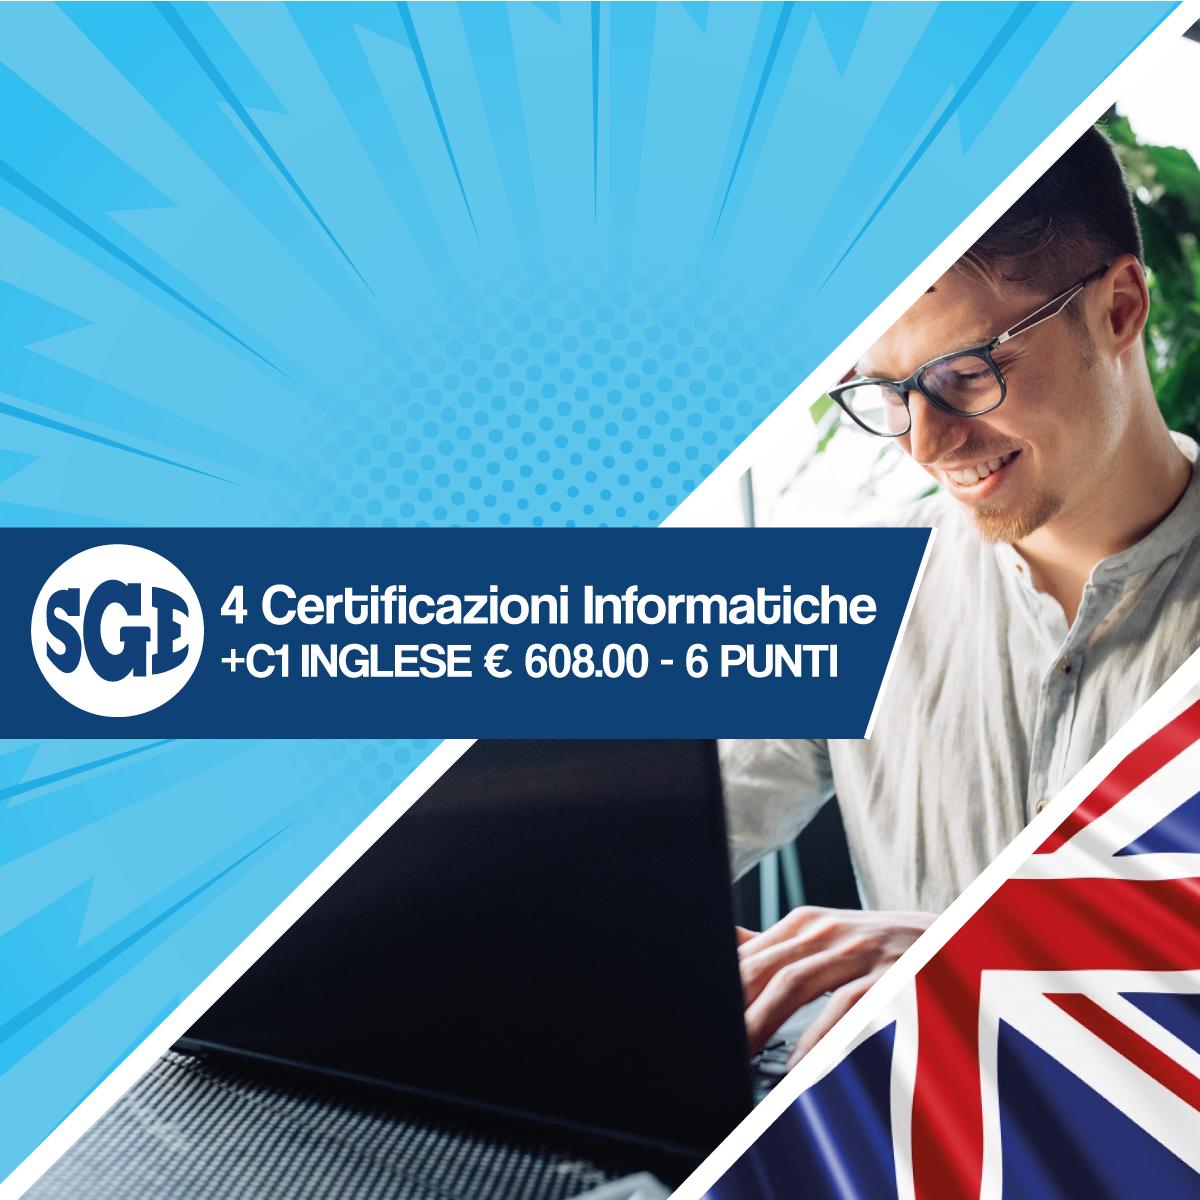 4 Certificazioni Informatiche +C1 INGLESE €608.00 - 6 PUNTI